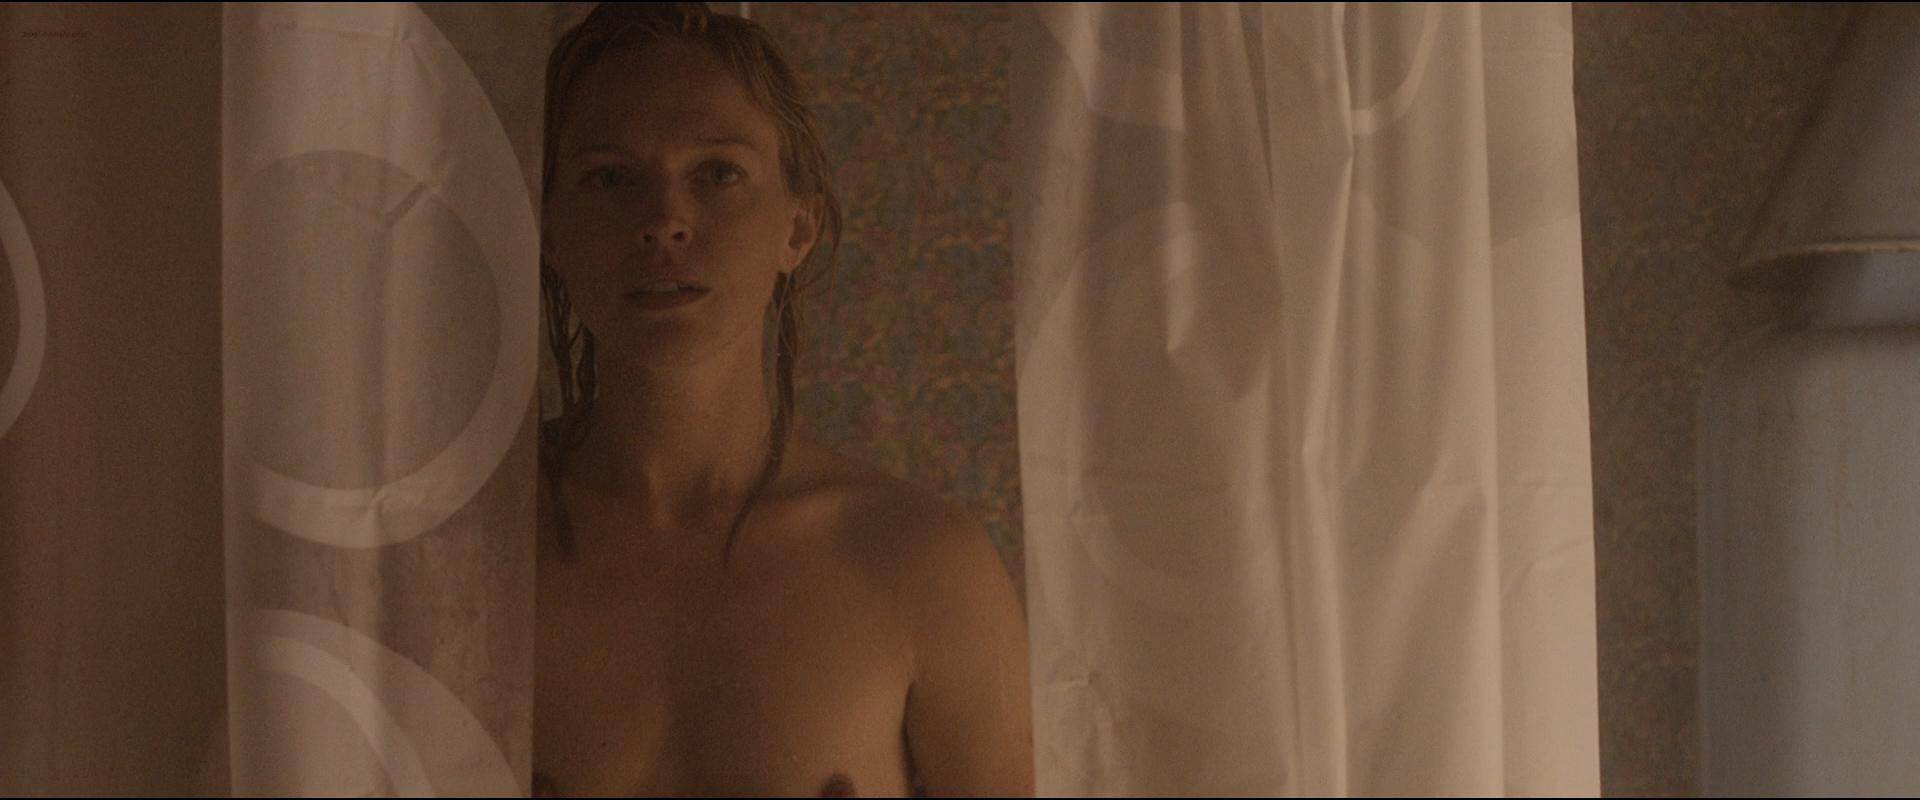 Loes Haverkort nude hot sex - Rendez-Vous (NL-2015) HD 1080p BluRay (10)